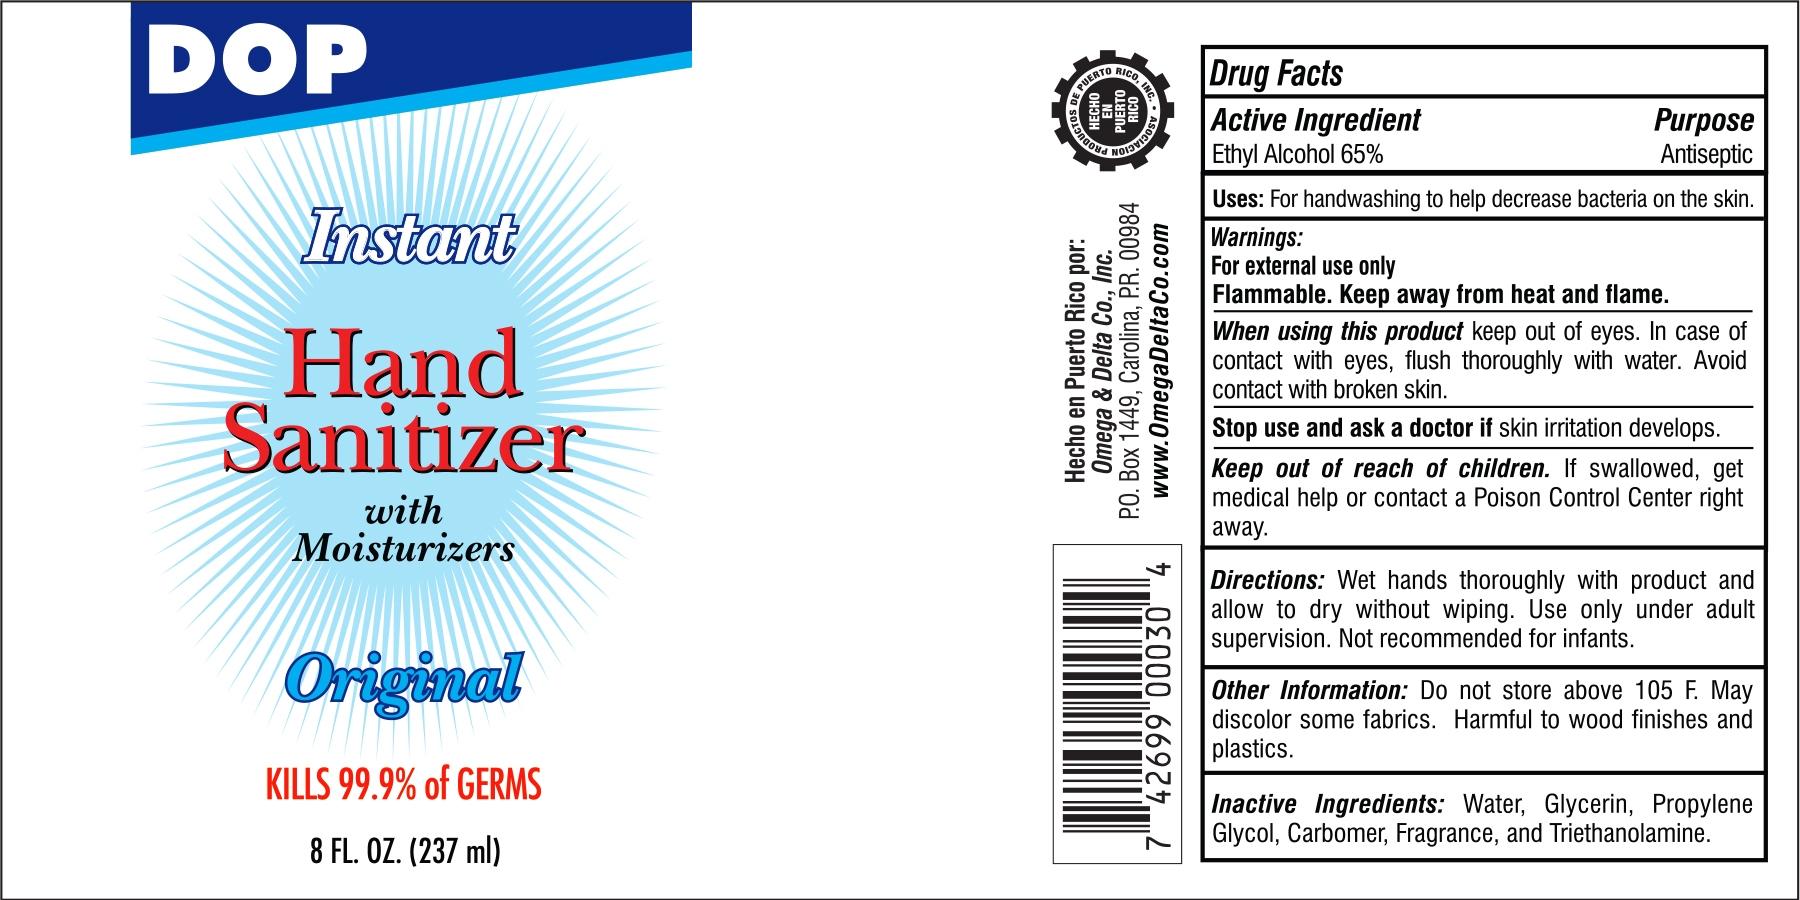 DOP Hand Sanitizer